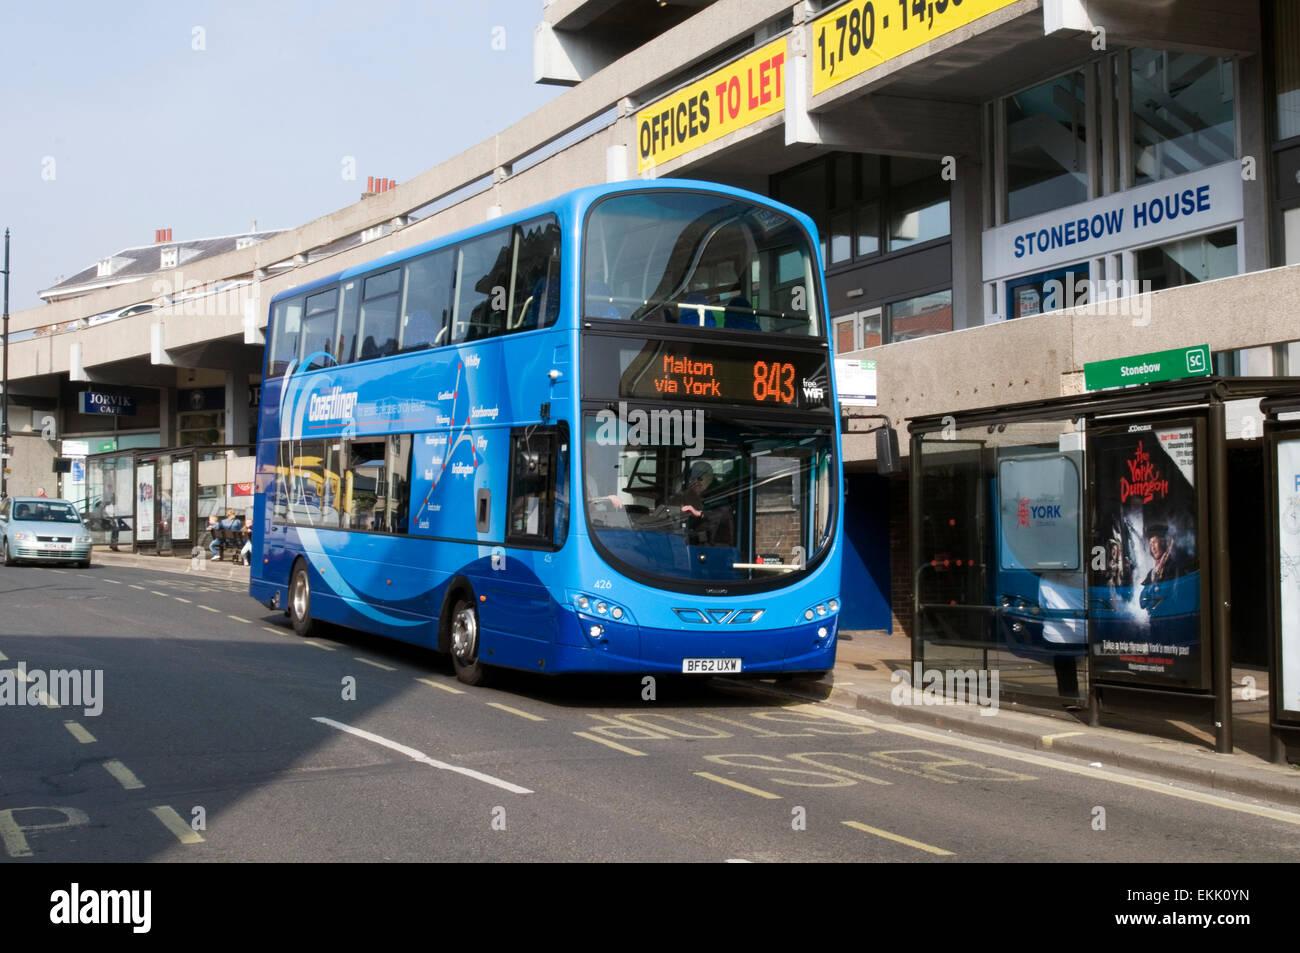 coastliner double decker bus in York 843 malton A64 buses blue - Stock Image